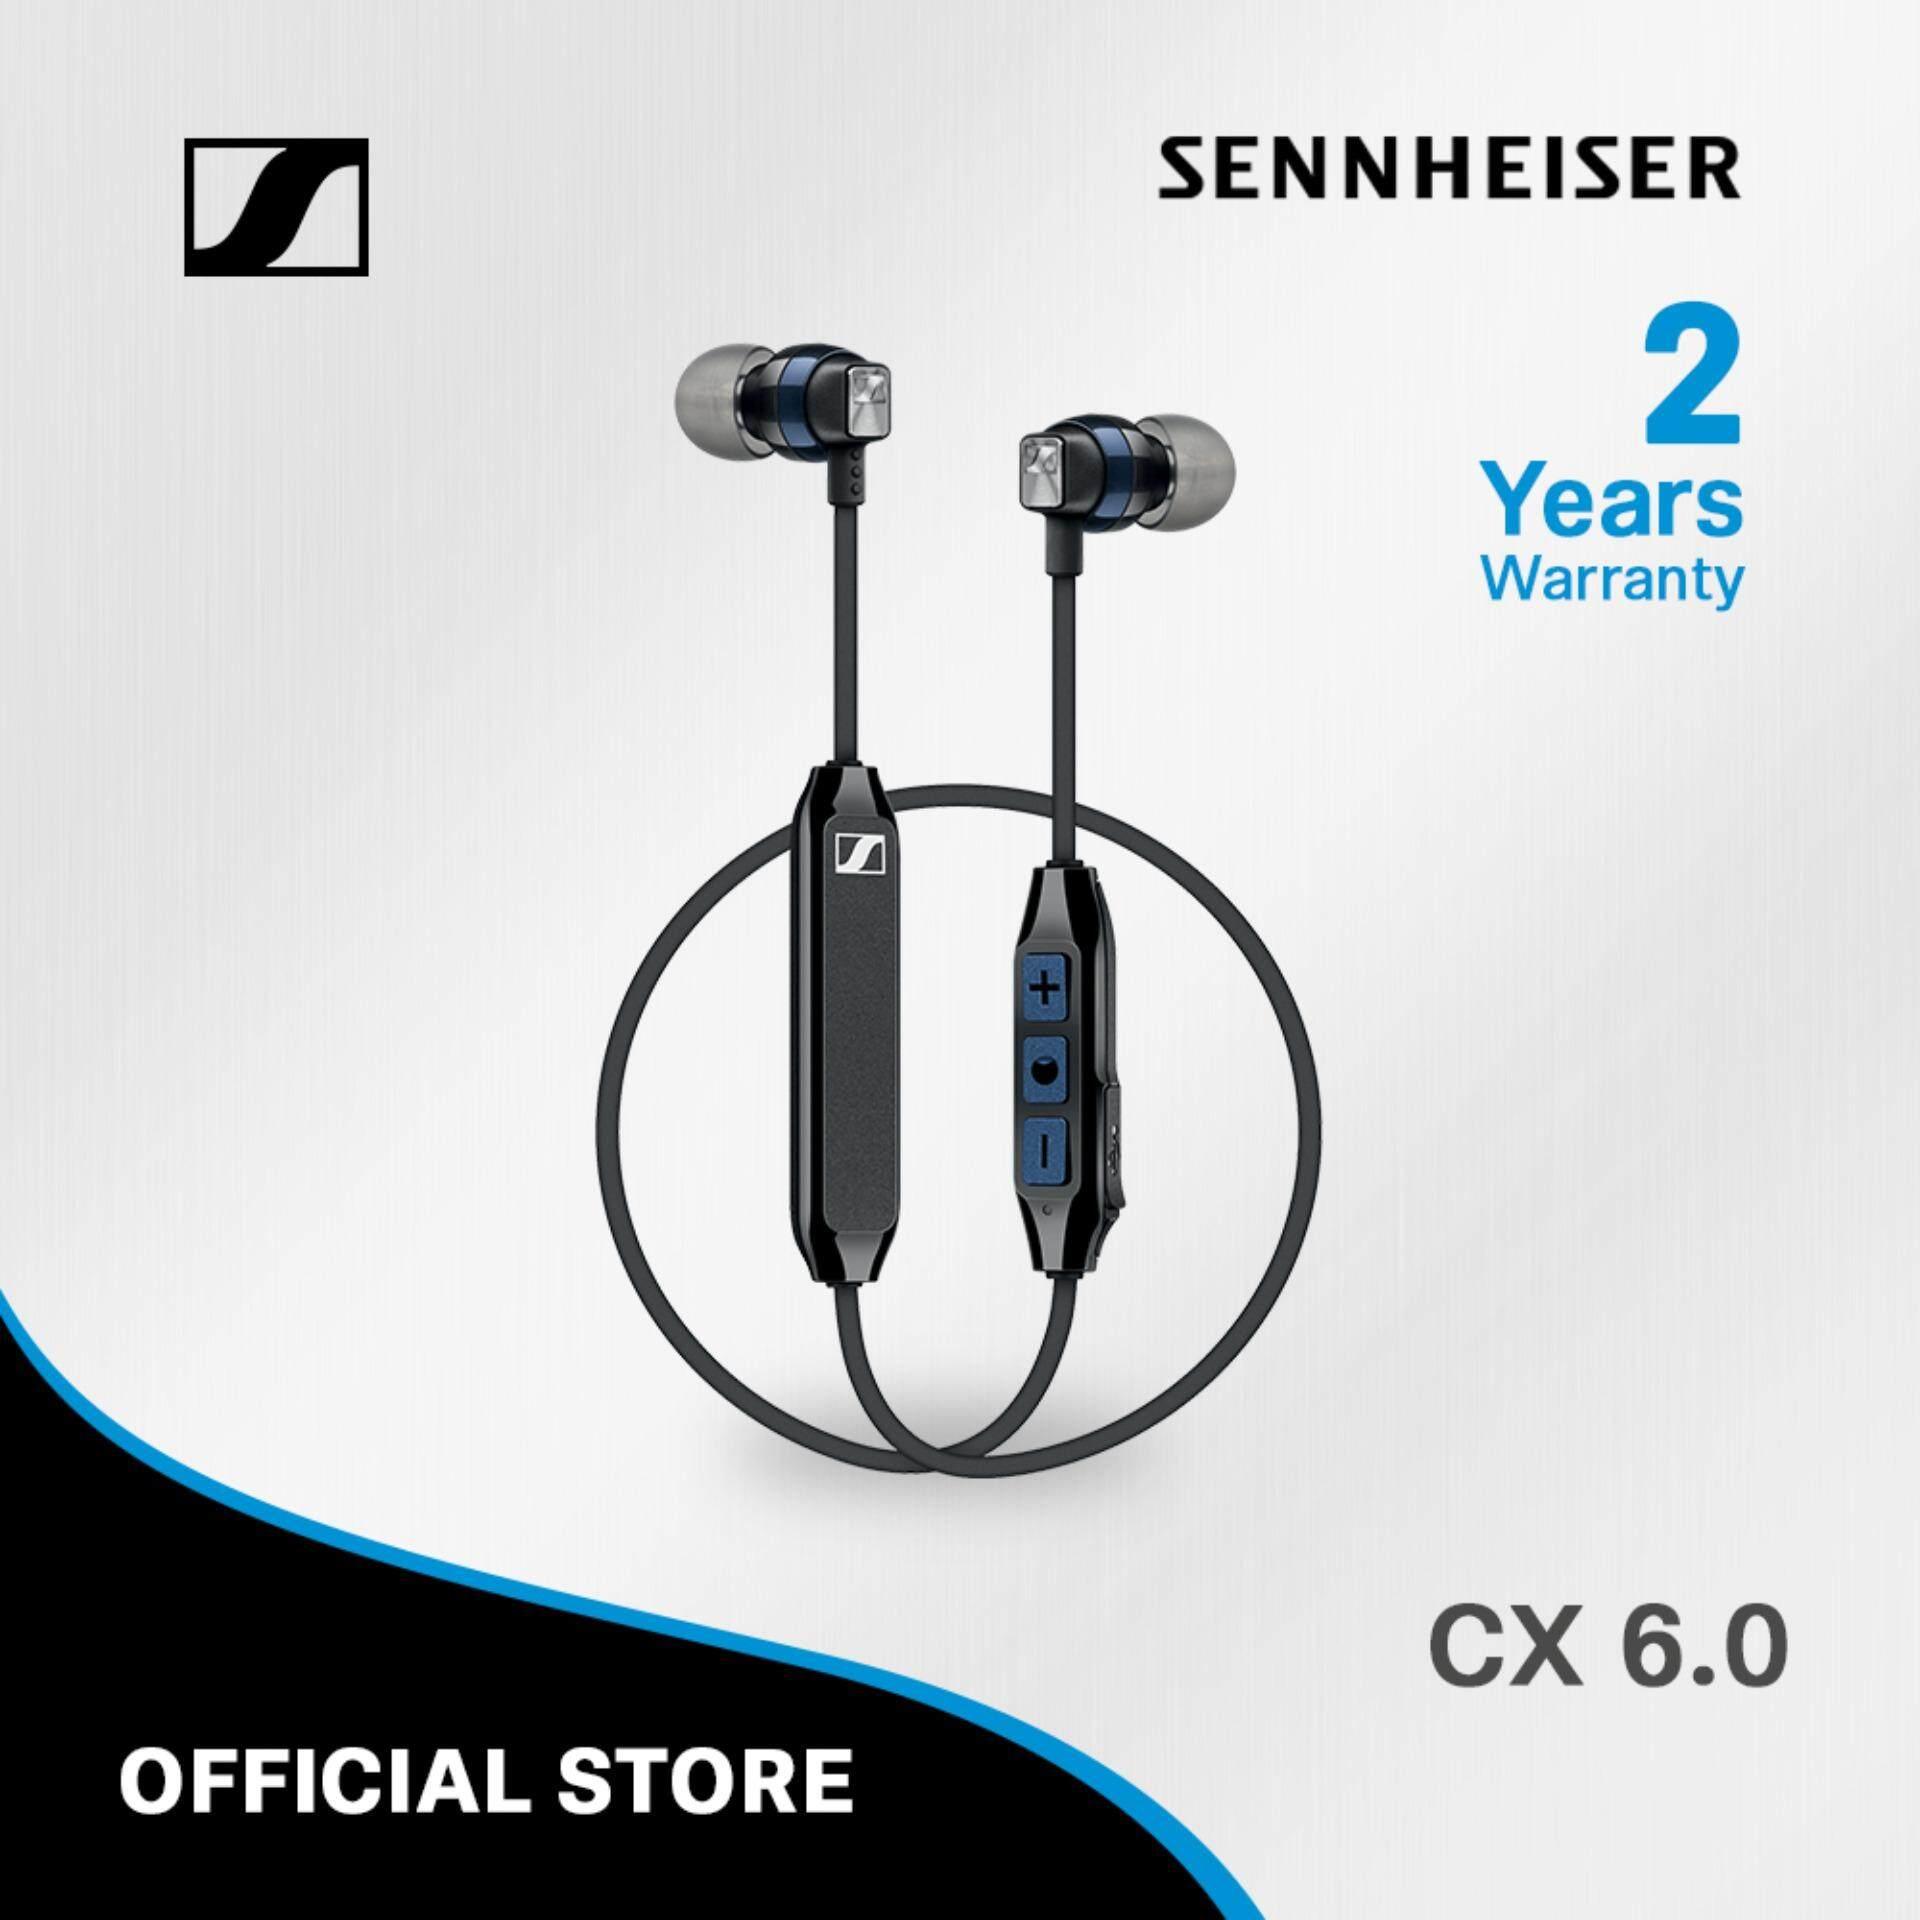 Sennheiser หูฟังอินเอียร์บลูทูธ รุ่น CX 6.00BT พร้อมไมโครโฟนและรีโมต  - รีวิว Sennheiser CX6.00BT หูฟังไร้สาย ฟังสนุก ไร้ดีเลย์